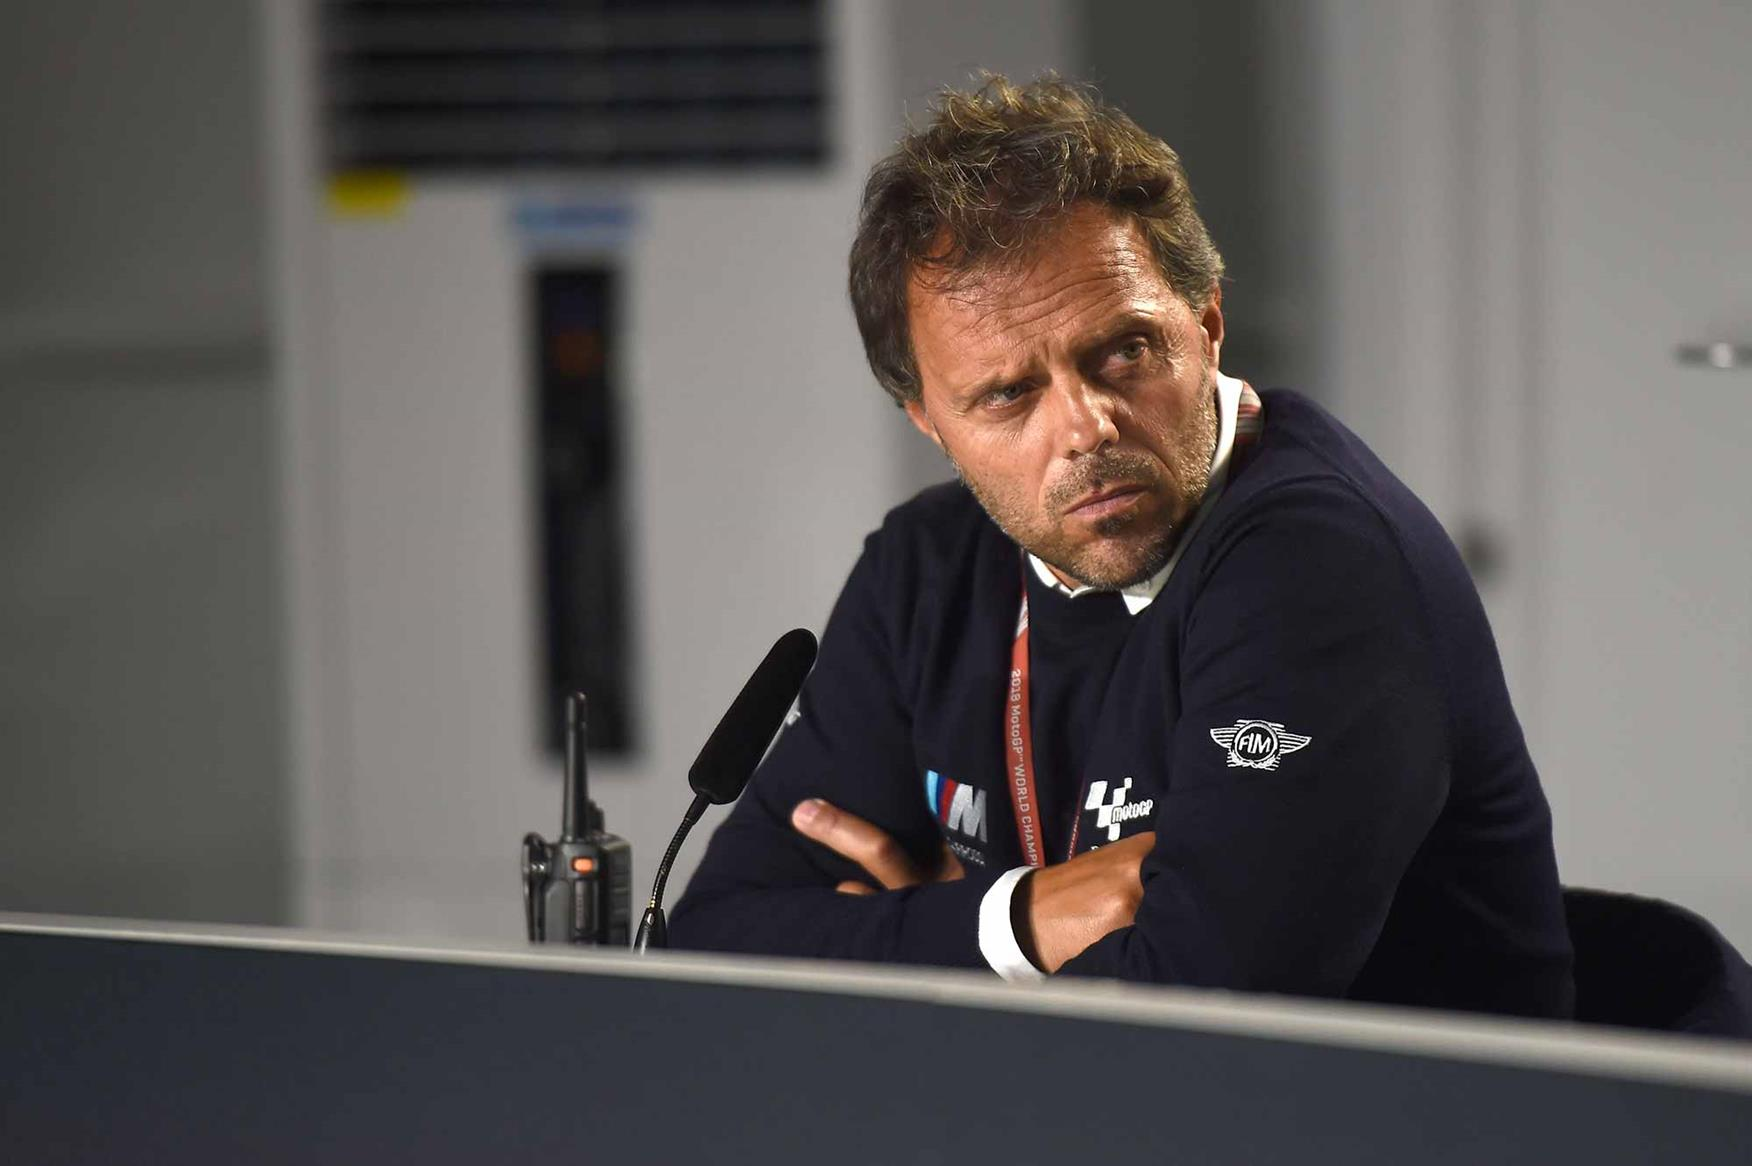 Loris Capirossi tried the new Daytona at Silverstone